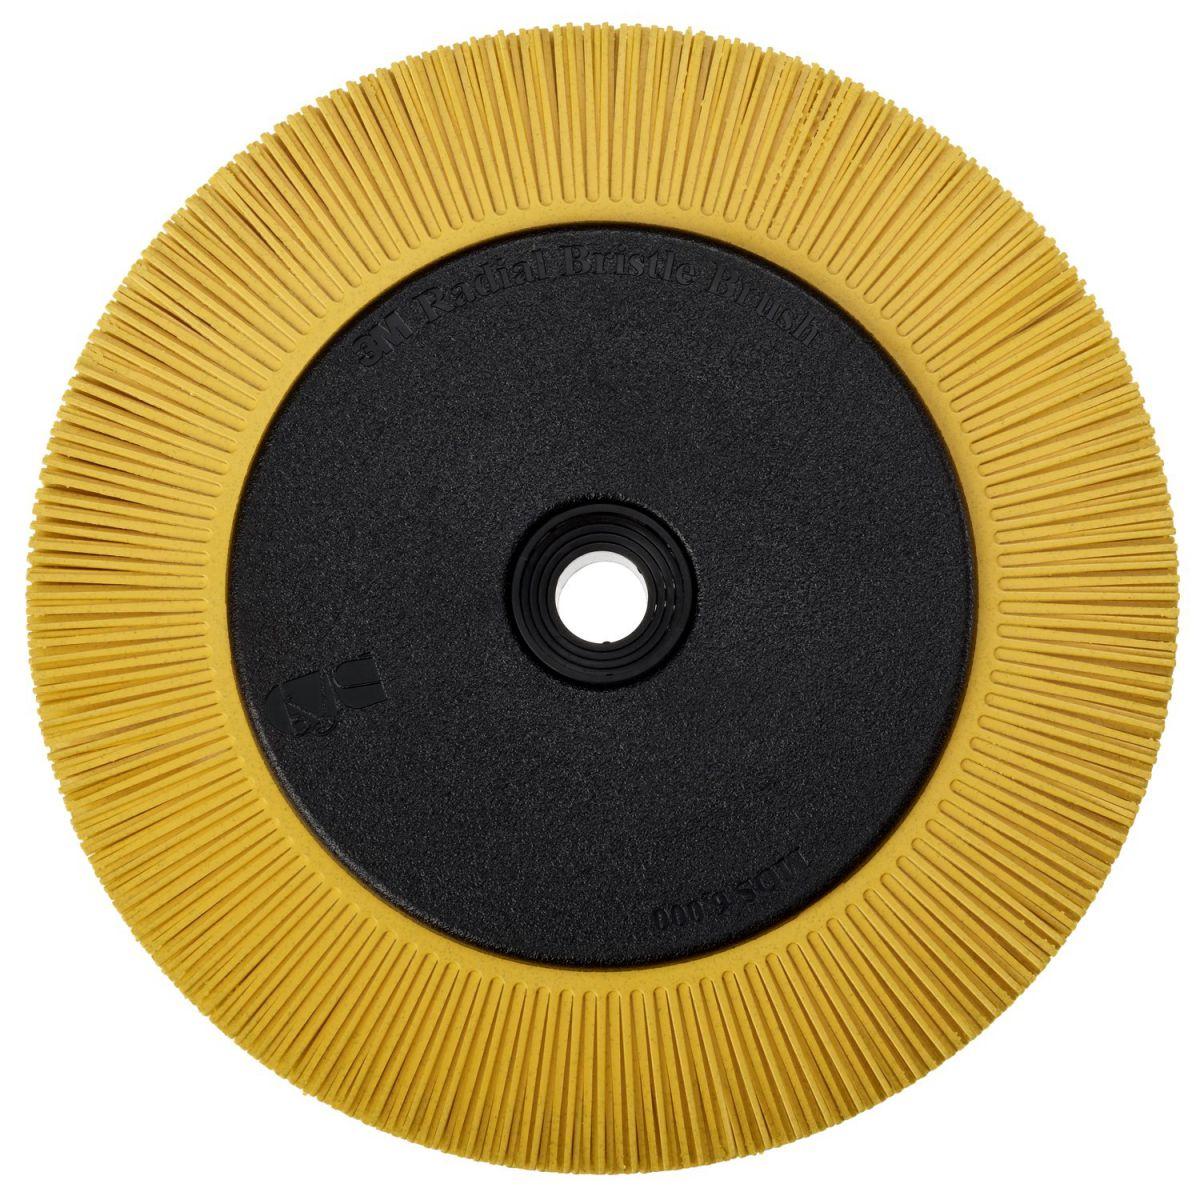 3m scotchbrite radial bristle borstel bbzb met adapter ts geel 203 mm x 25 mm x 32 mm p80